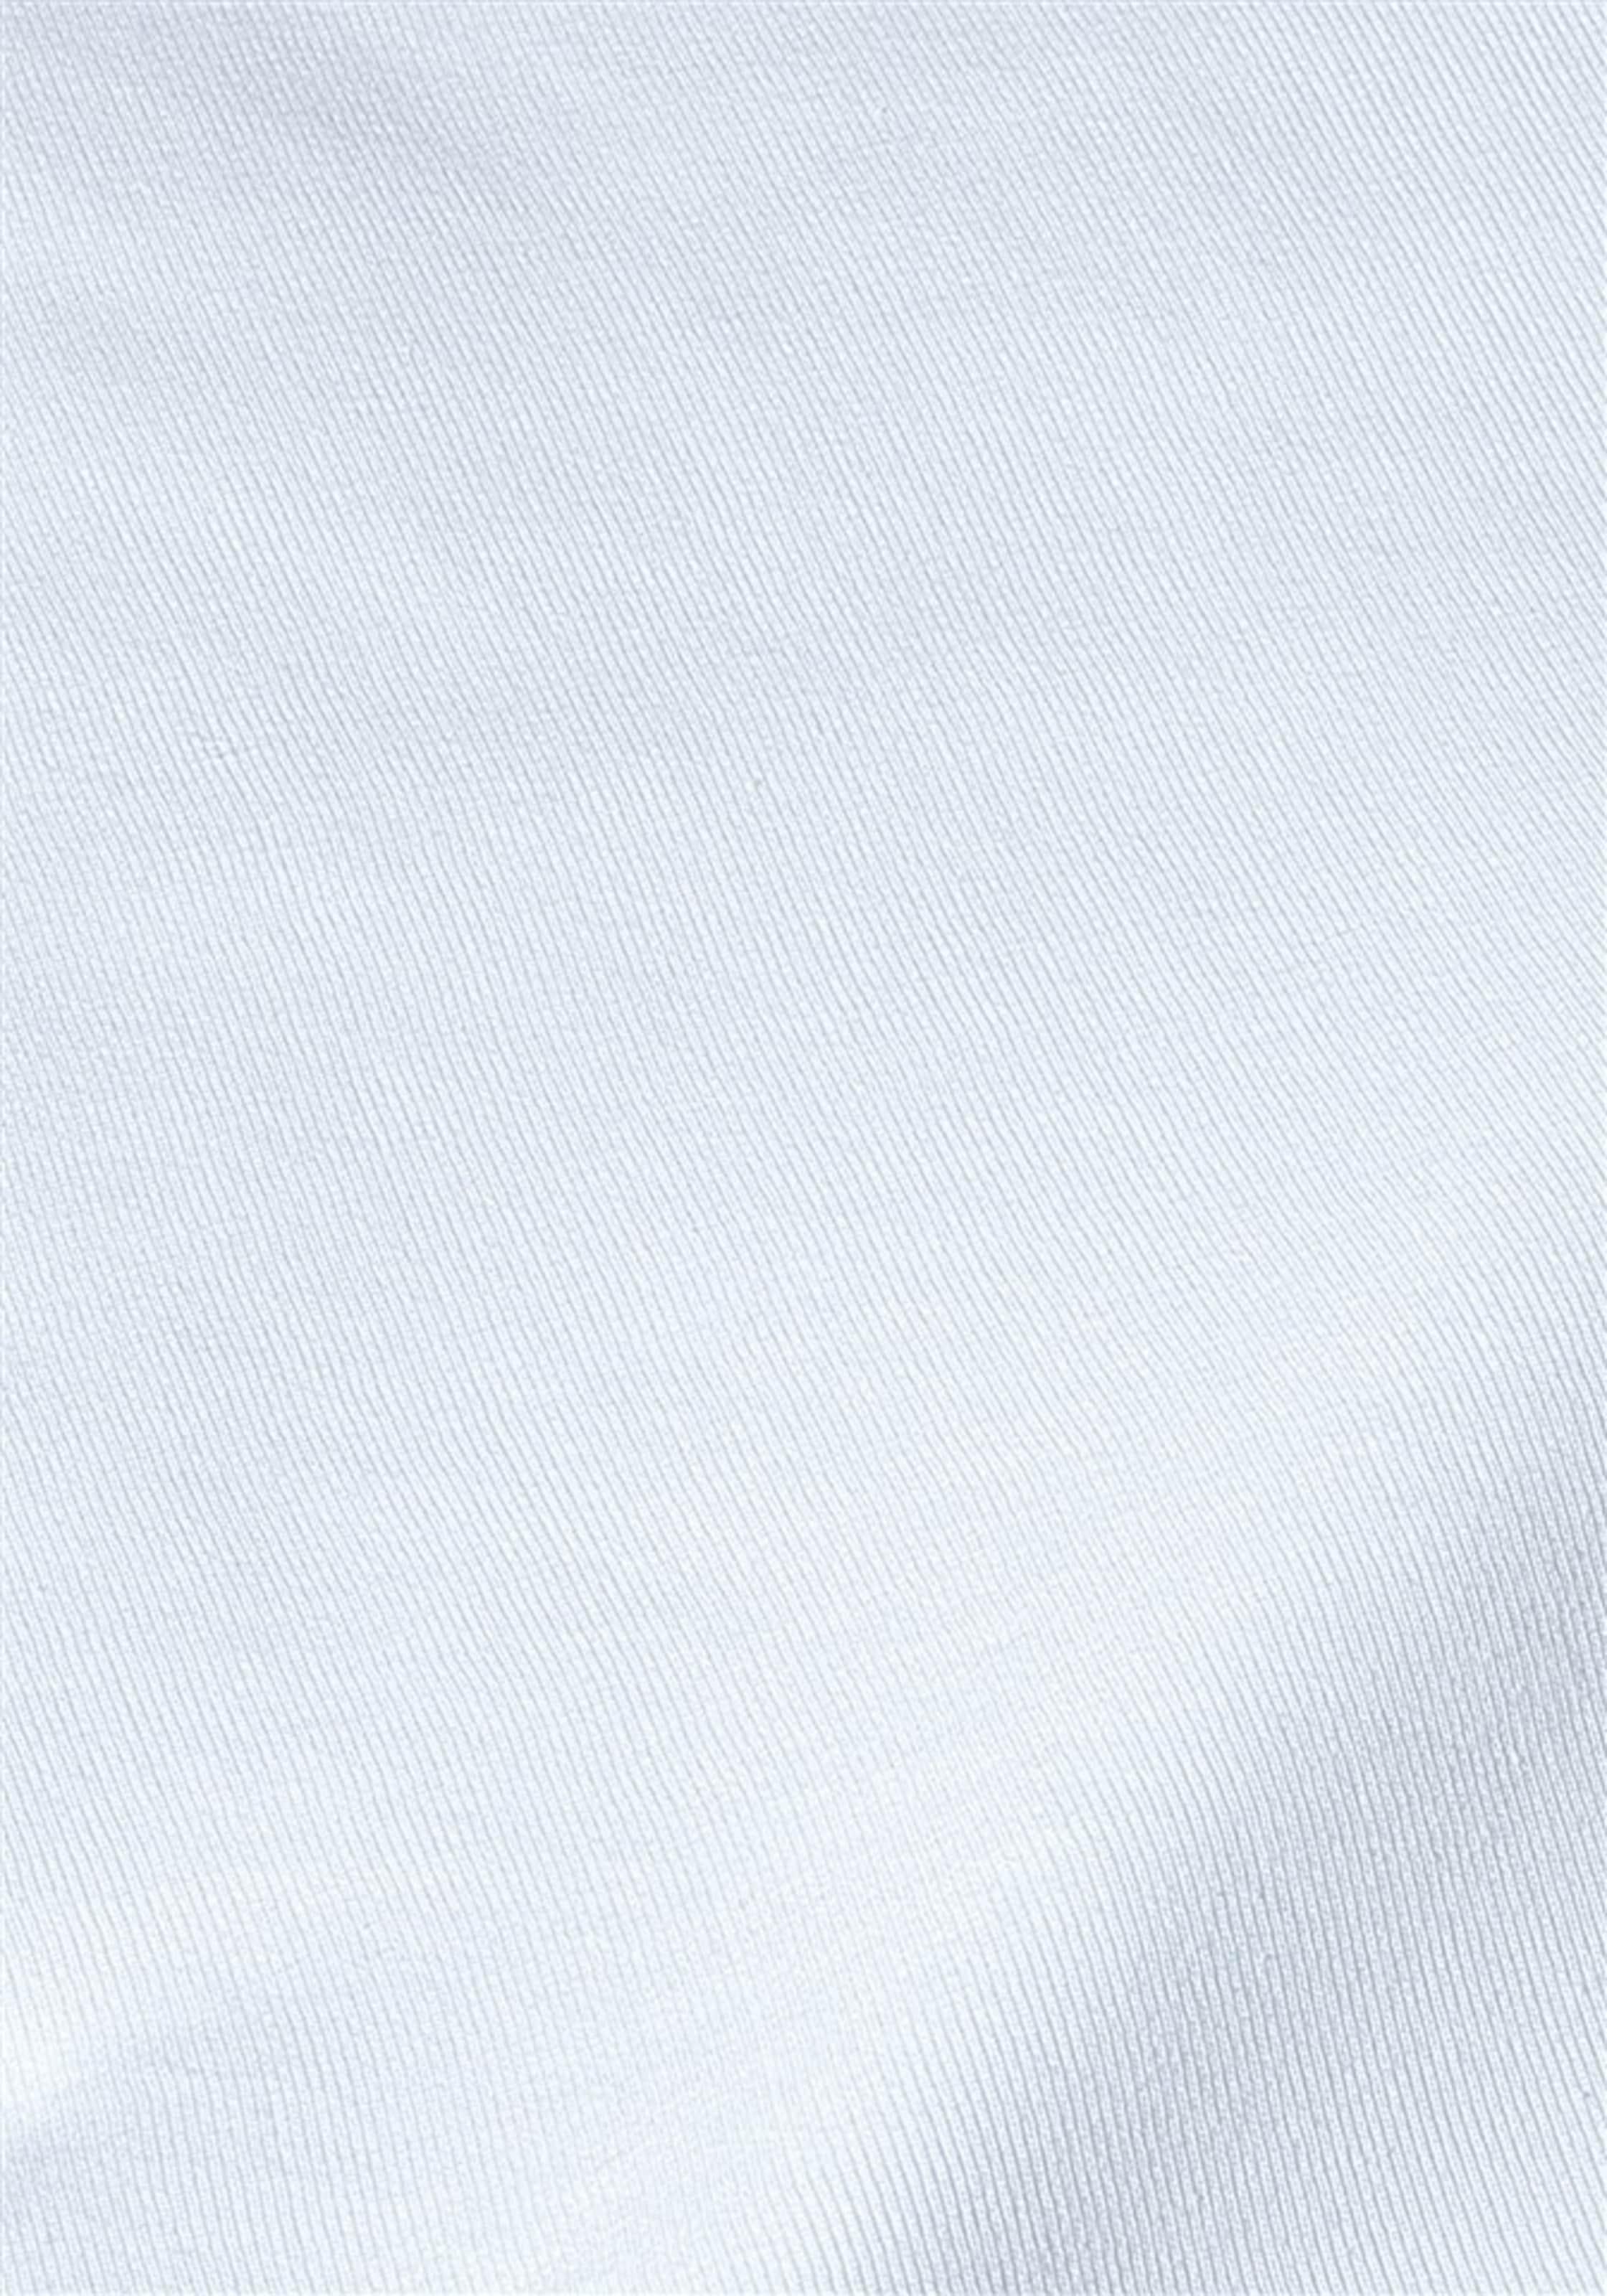 SCHIESSER Feinripp-Sportslips (3 Stck.) Billig Verkauf Freies Verschiffen Freies Verschiffen Truhe Finish KawzW2mS